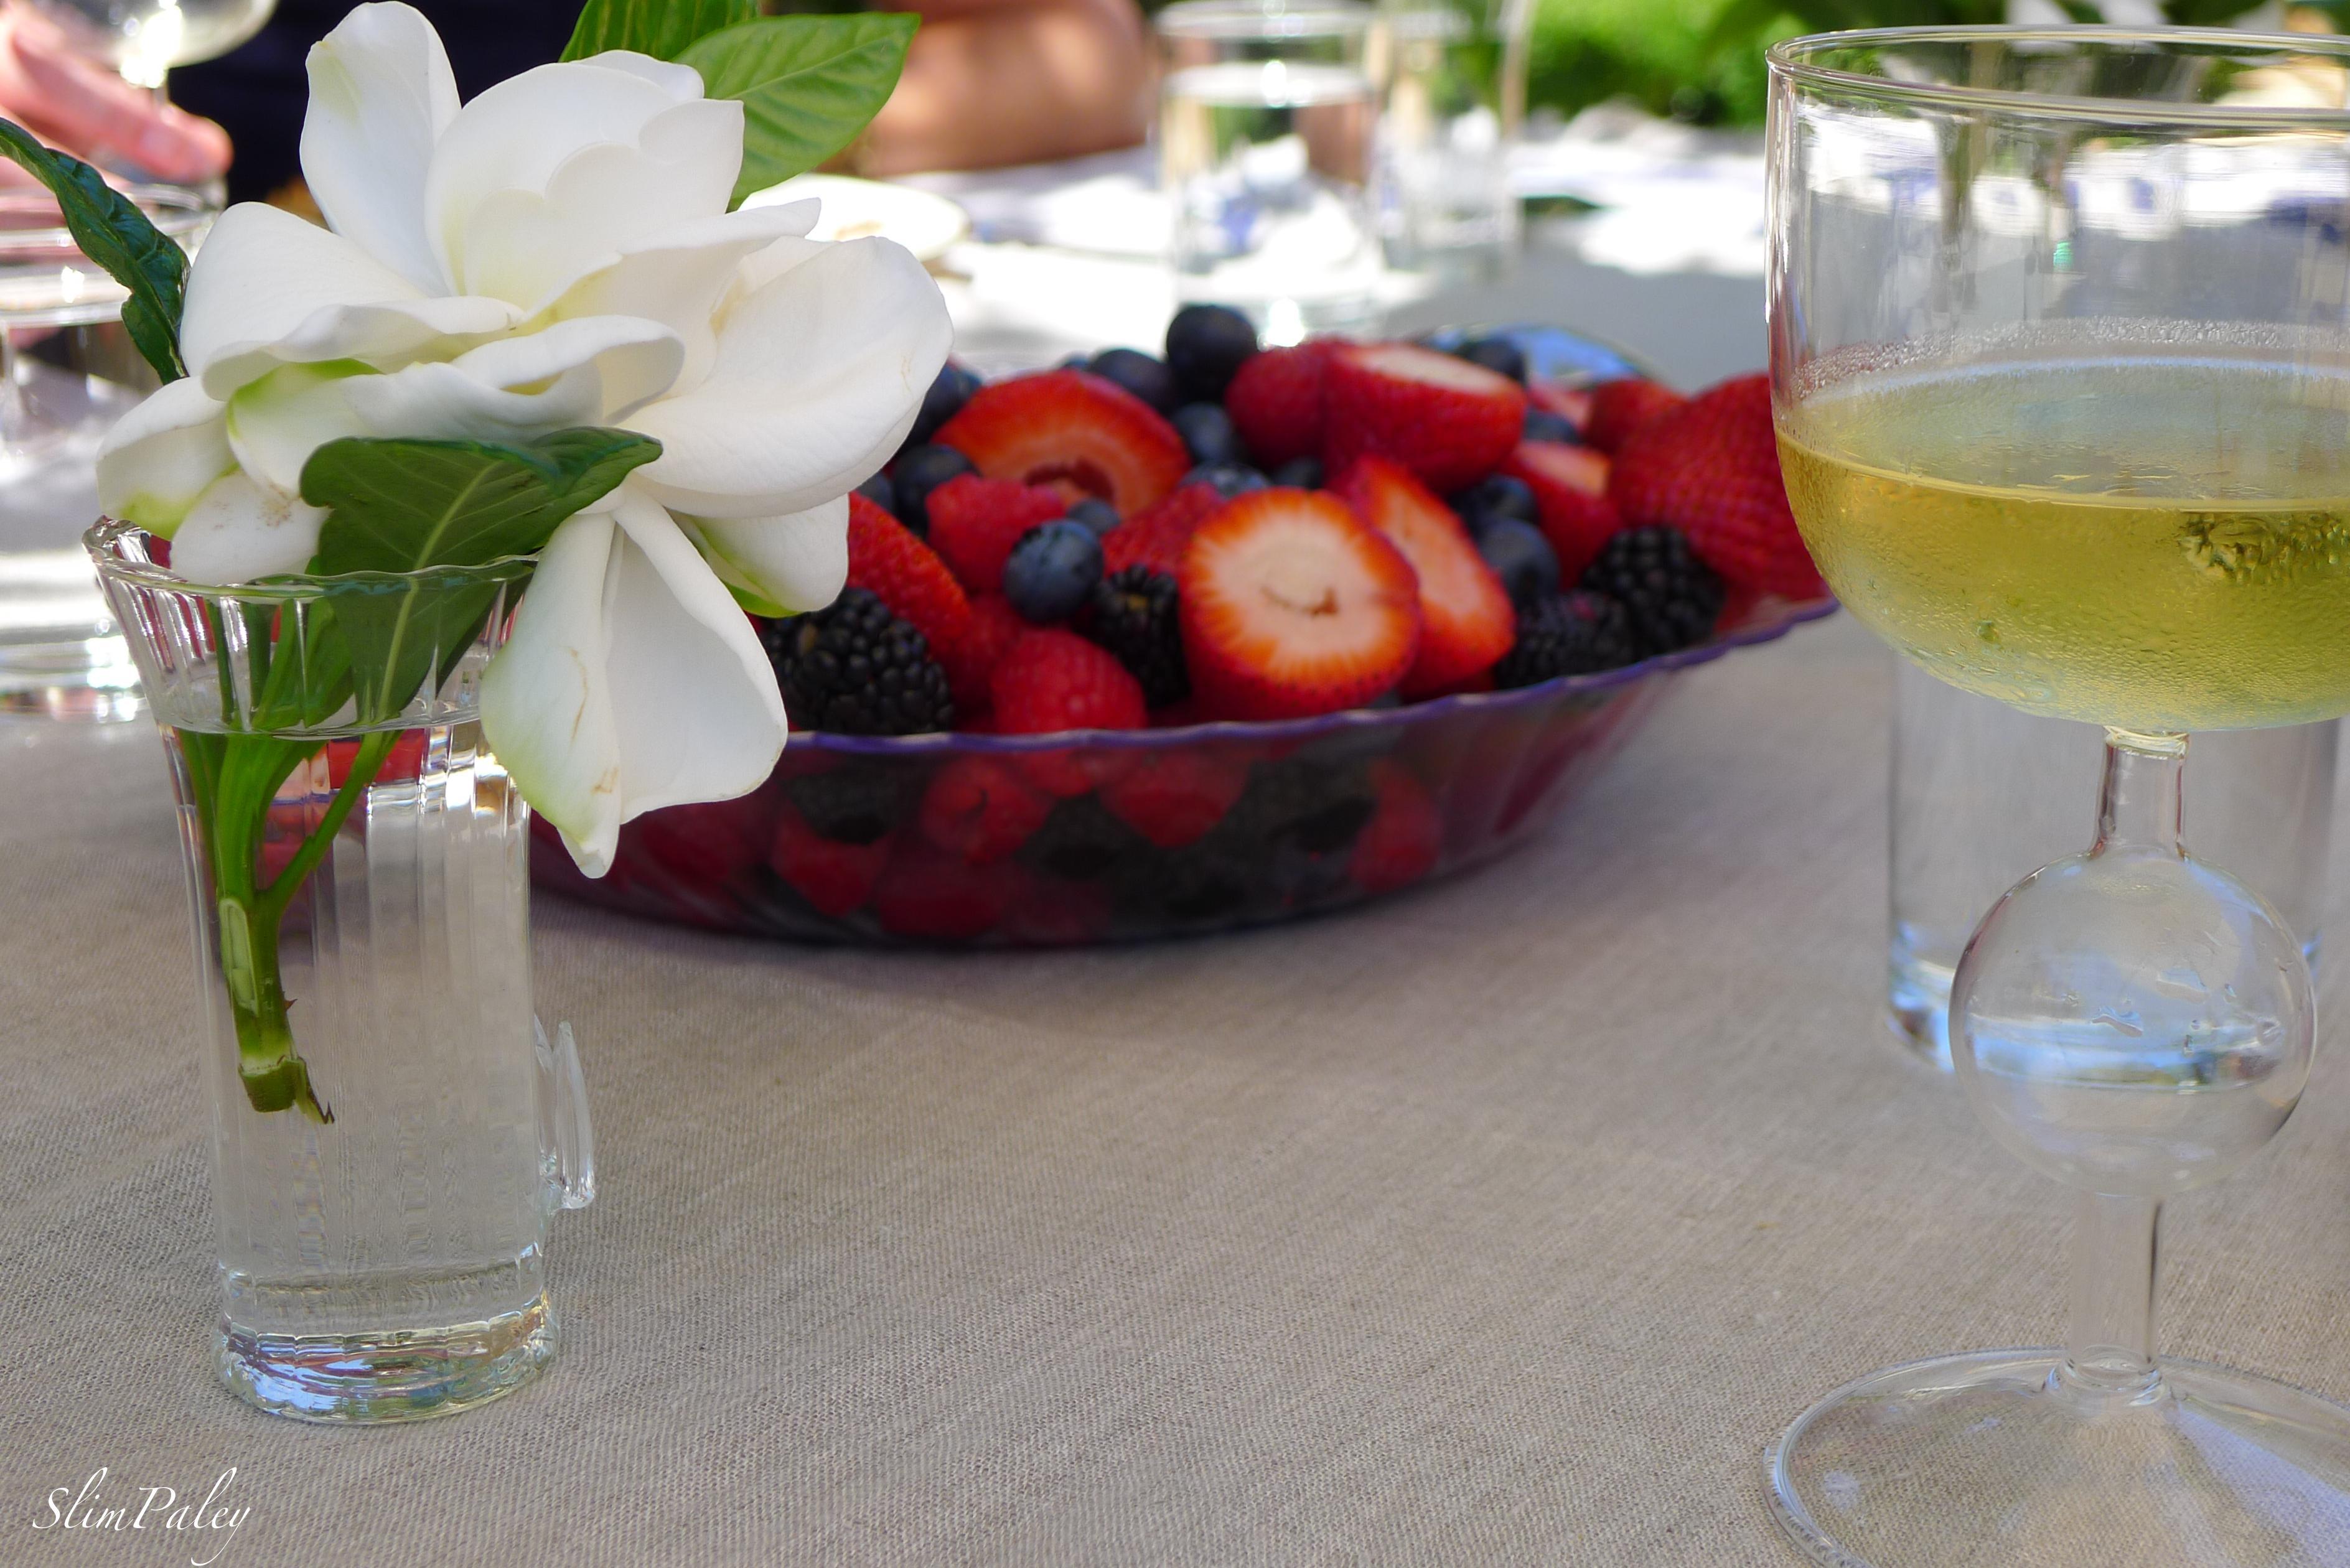 gardenias & berries